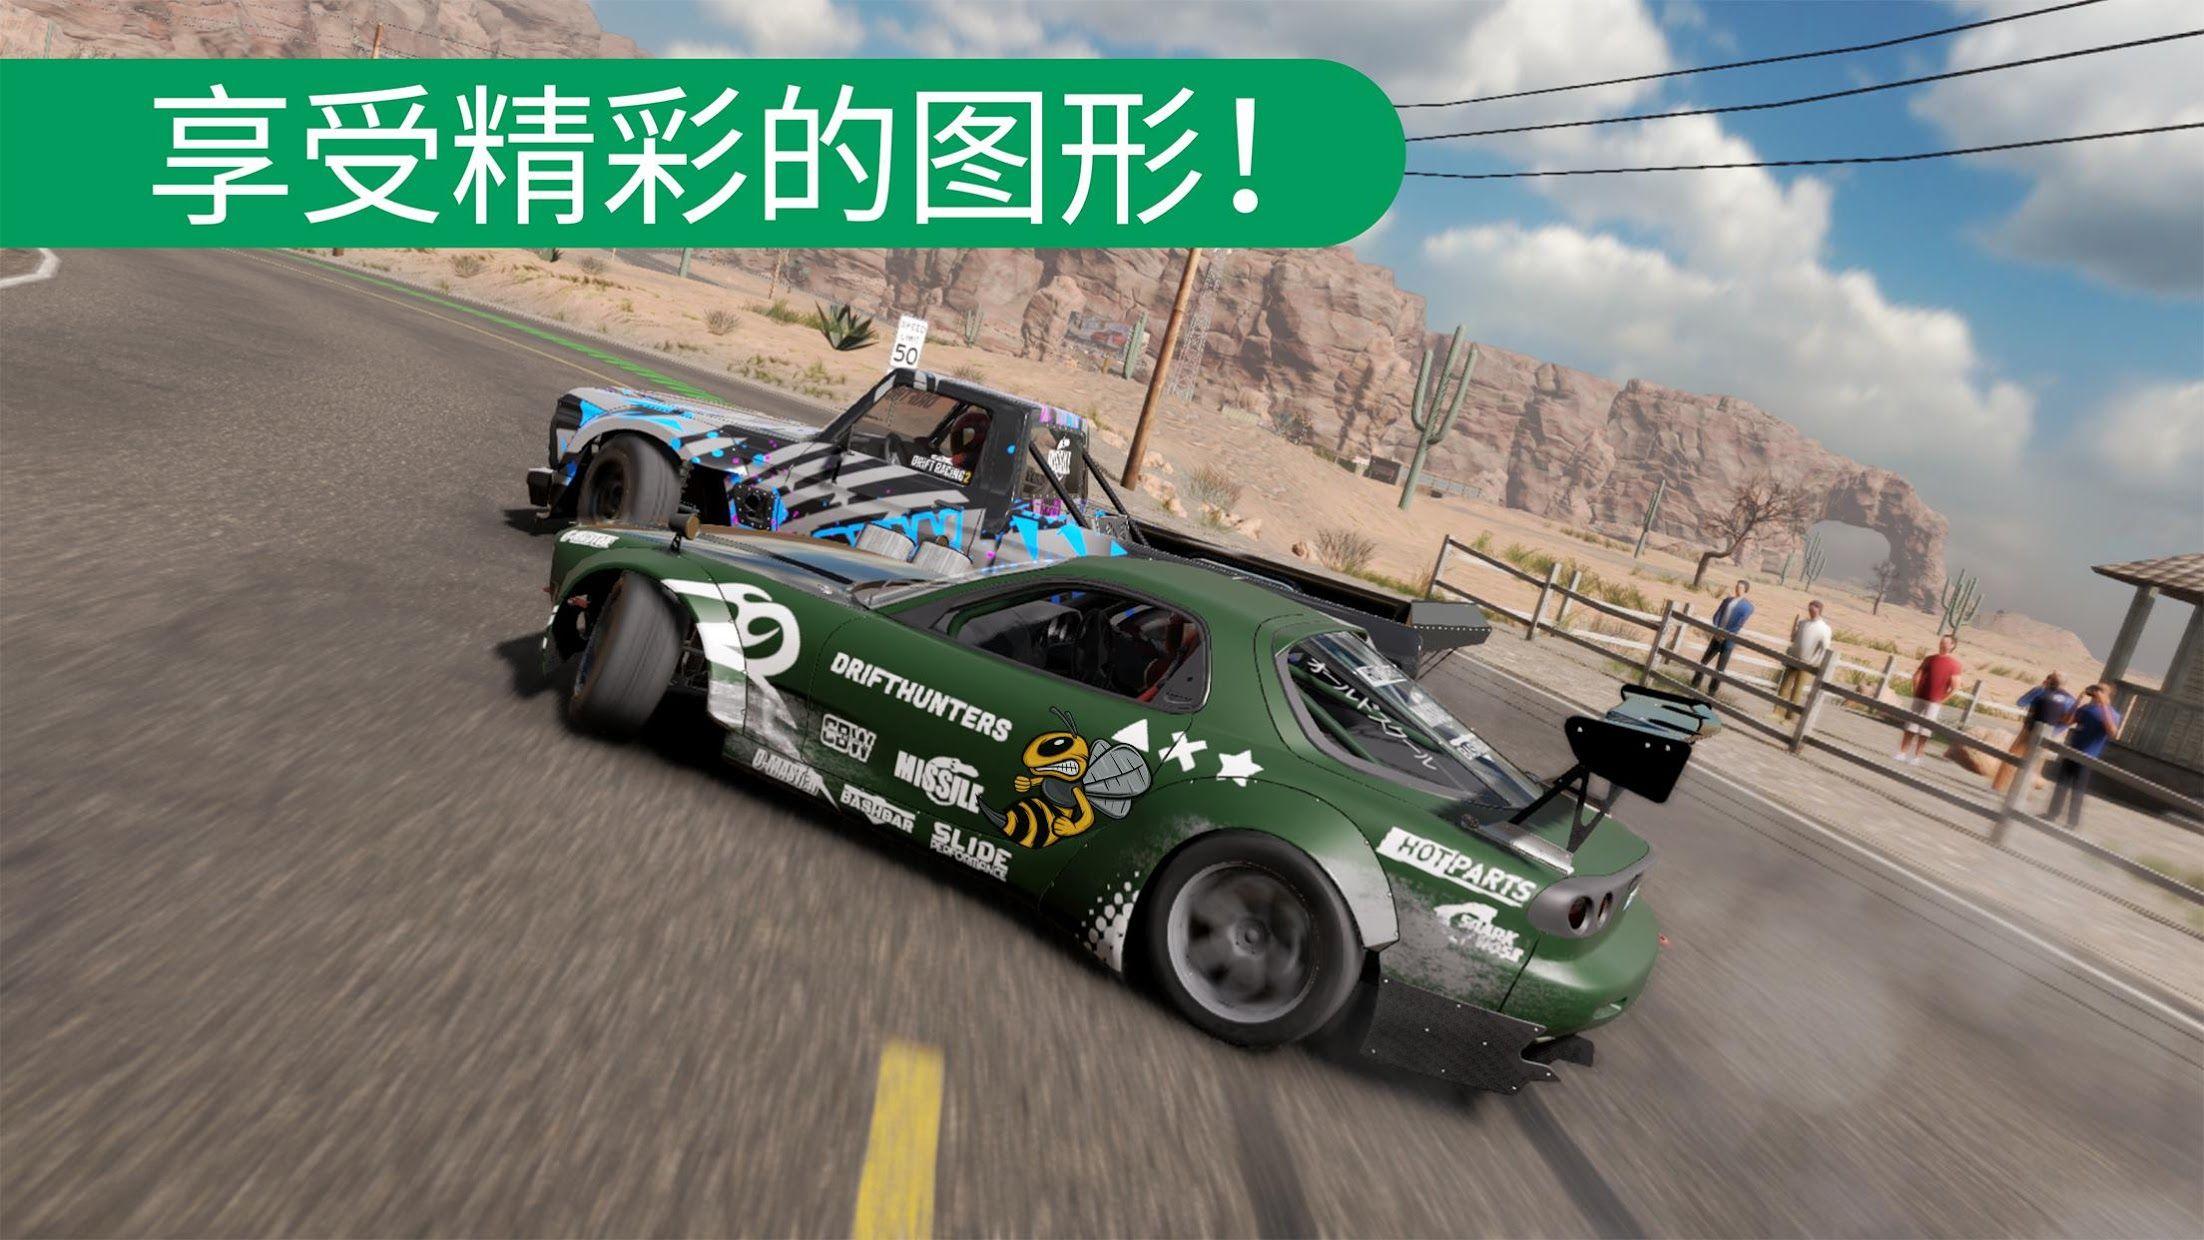 CarX 漂移赛车 2 游戏截图5